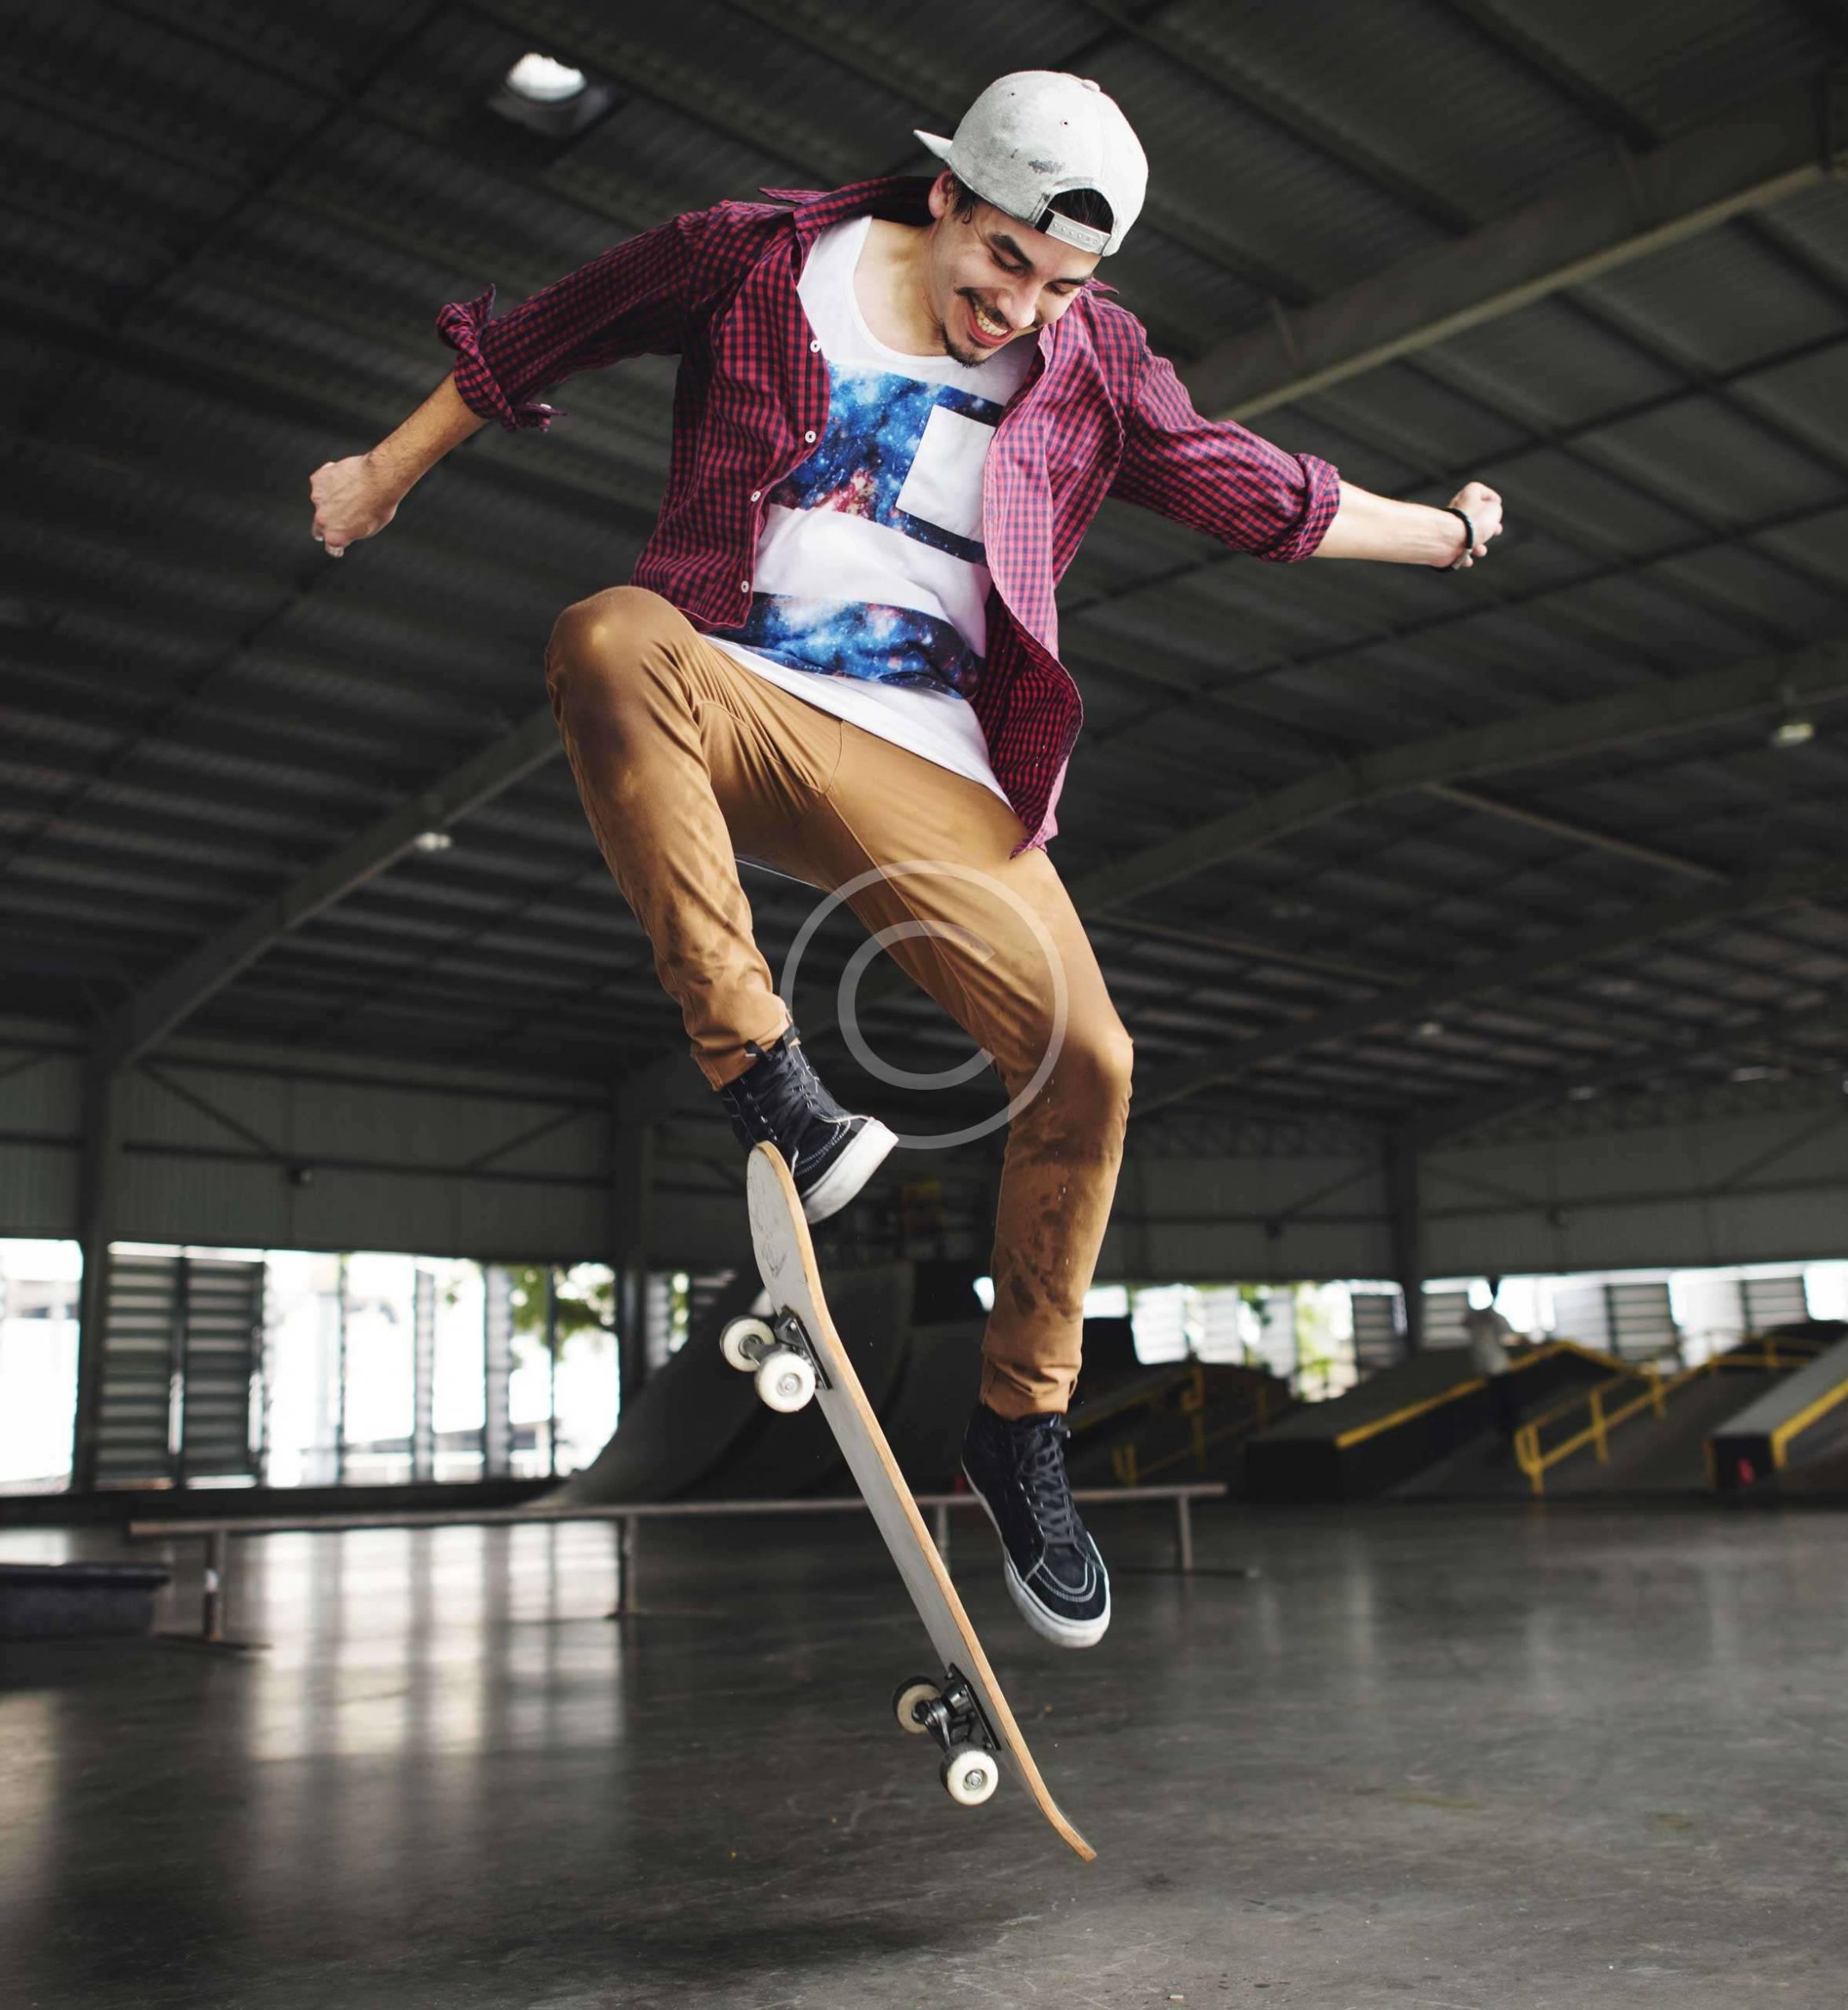 New Faces at 2016 Skater Jam California